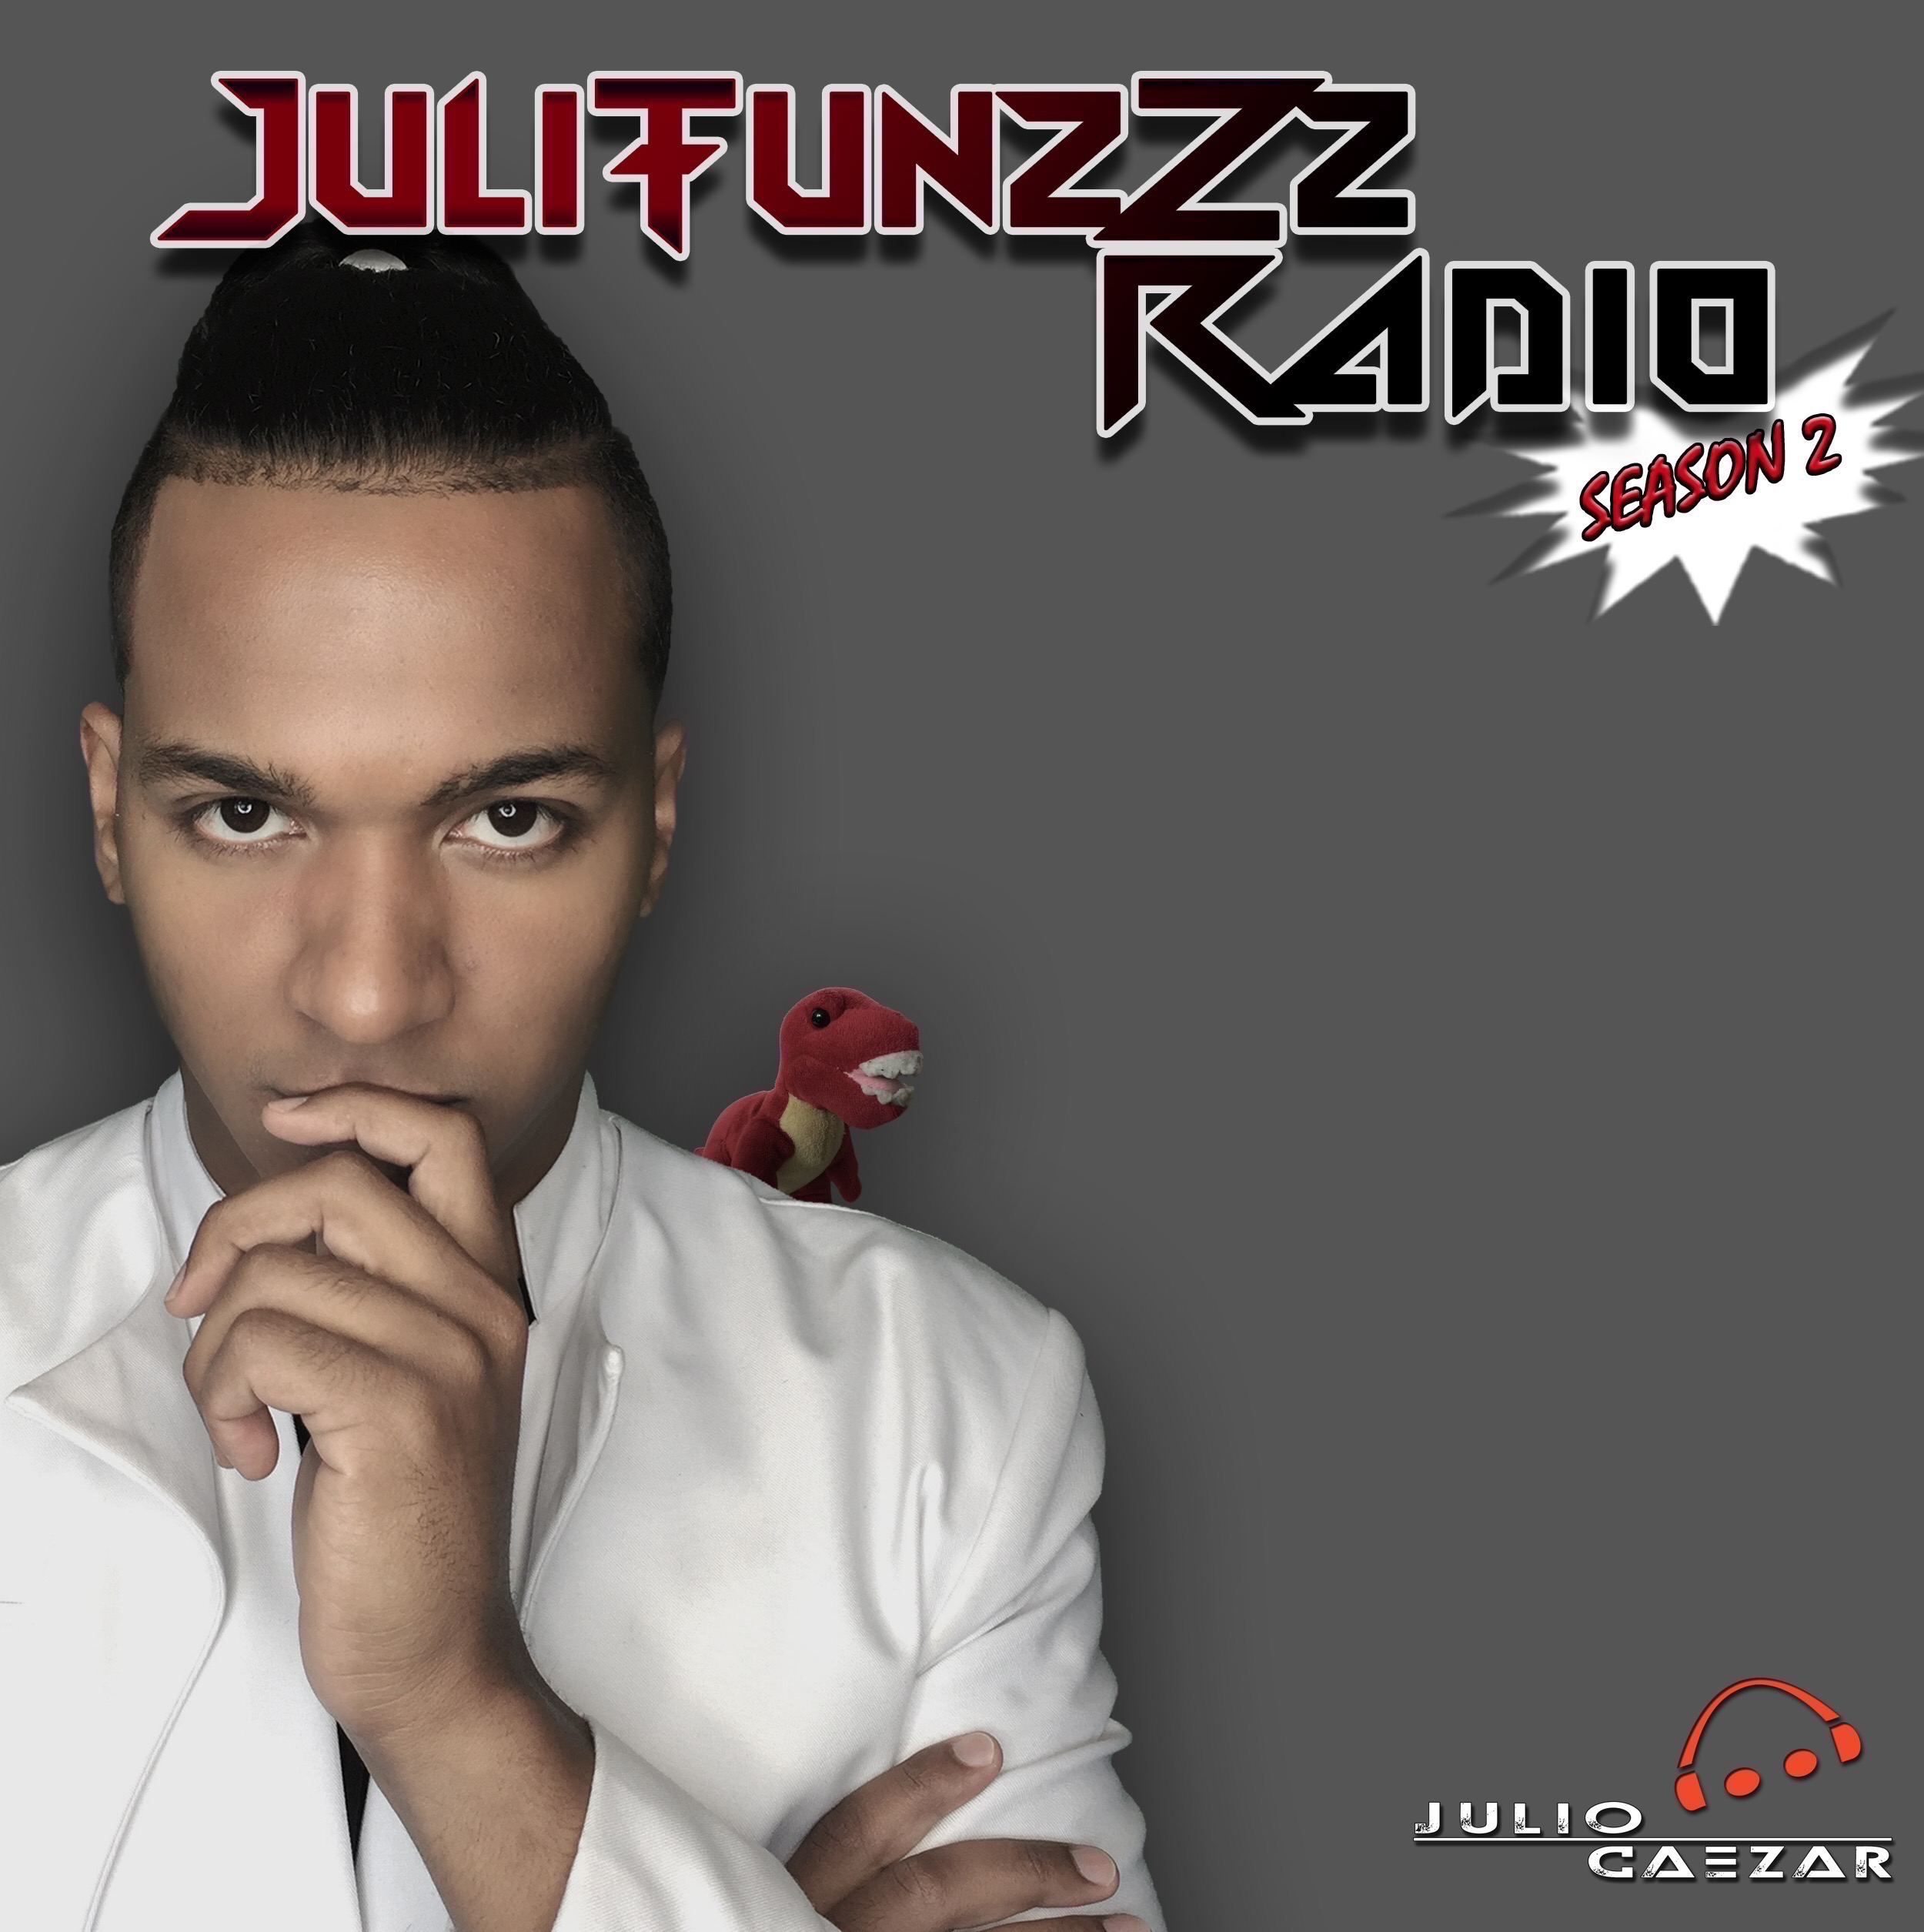 JuliTunzZz Radio Episode 24